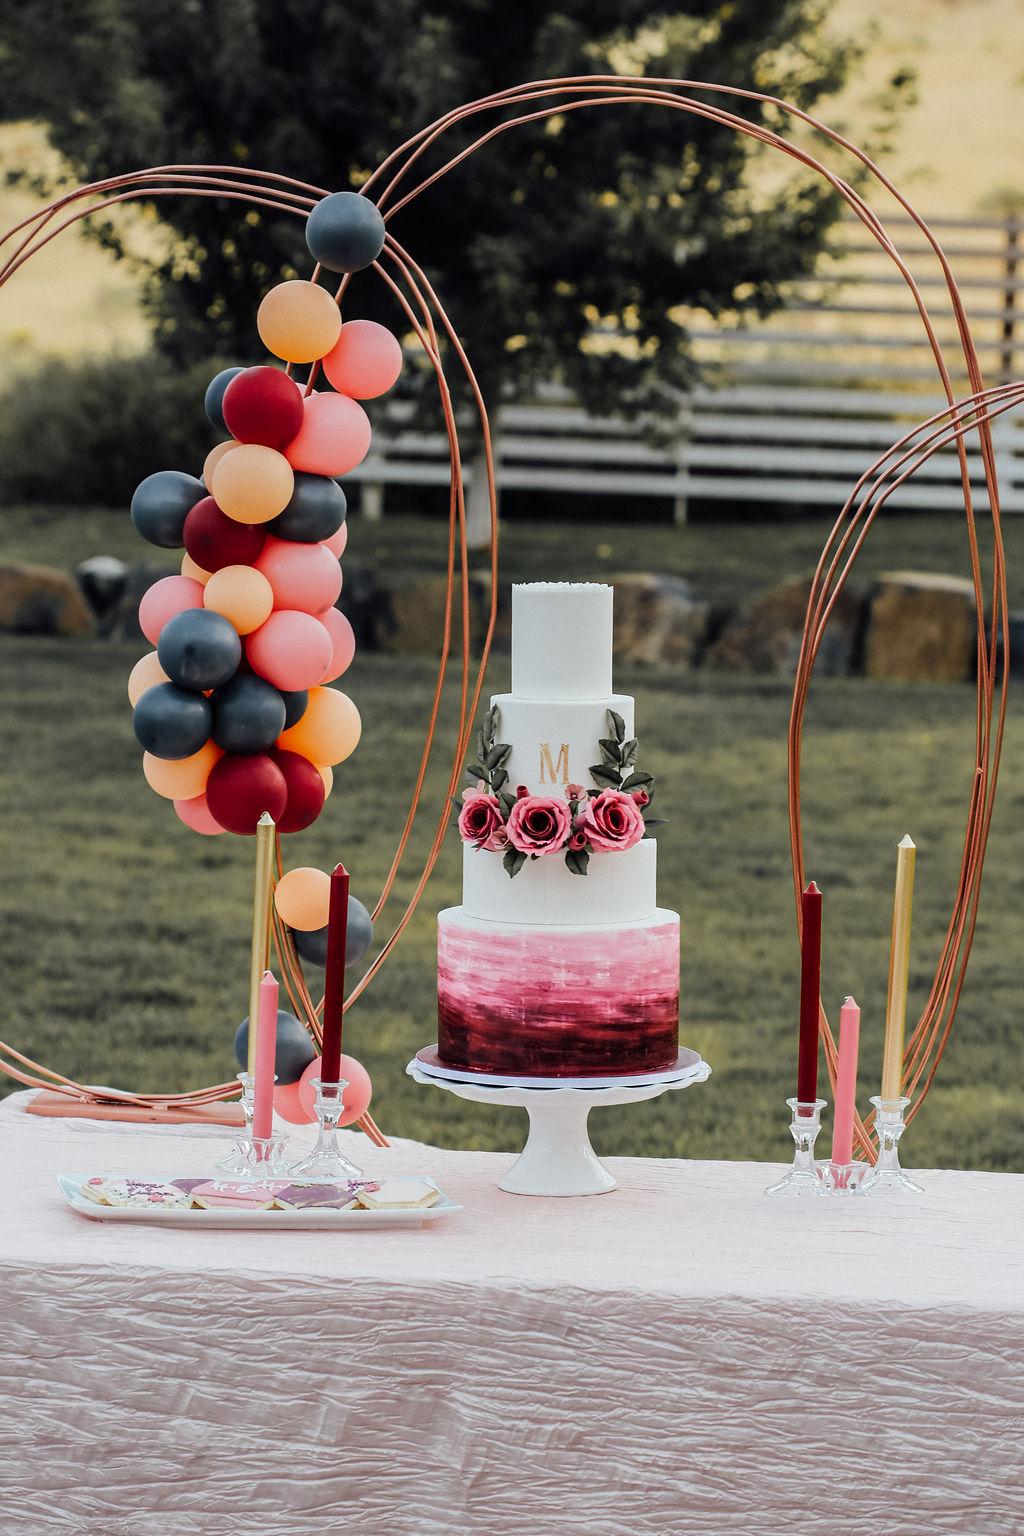 509 Bride_the 509 bride_purple pineapple photography_10